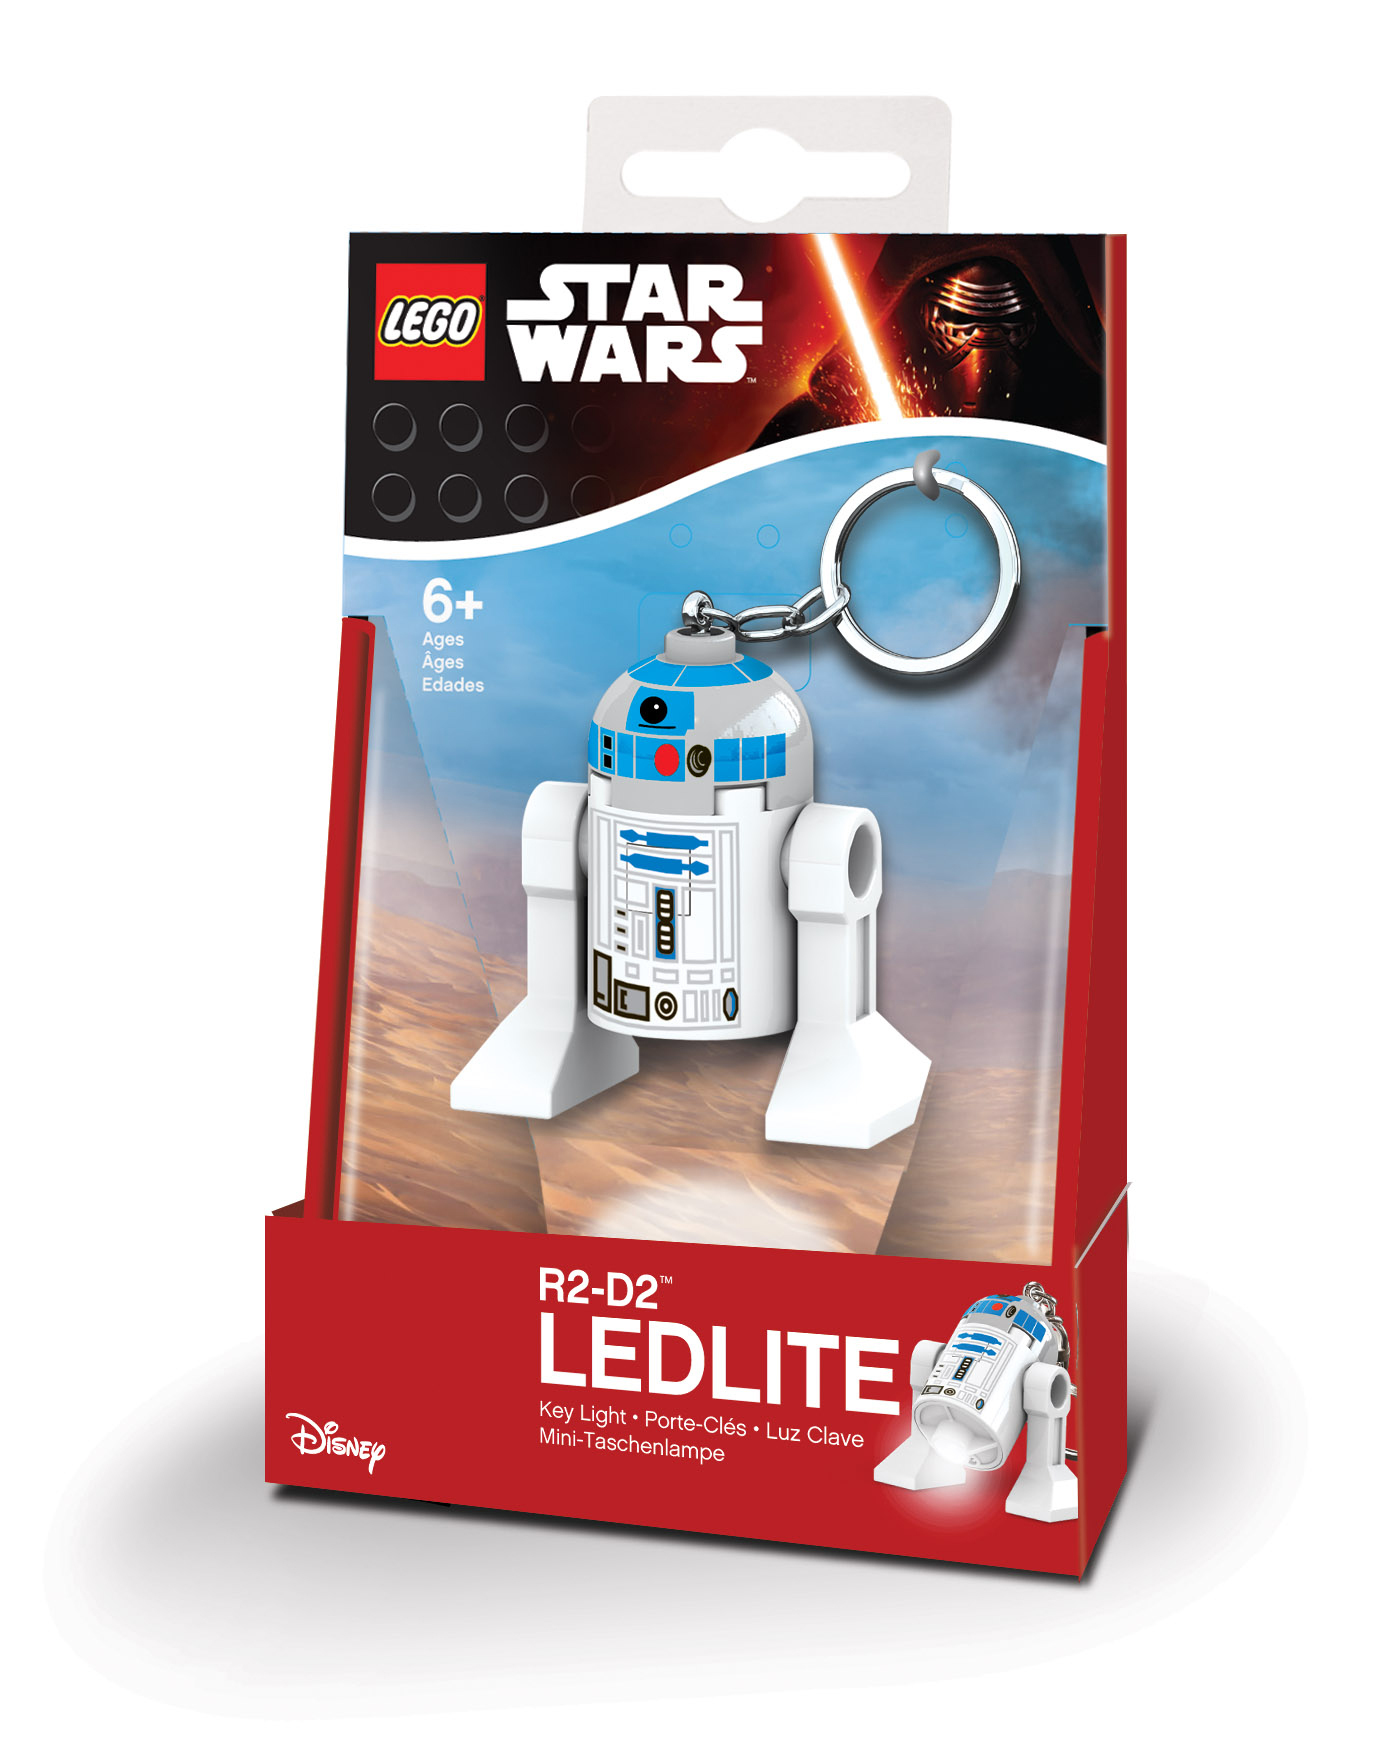 Lego Star Wars - Porte-clés LED R2D2